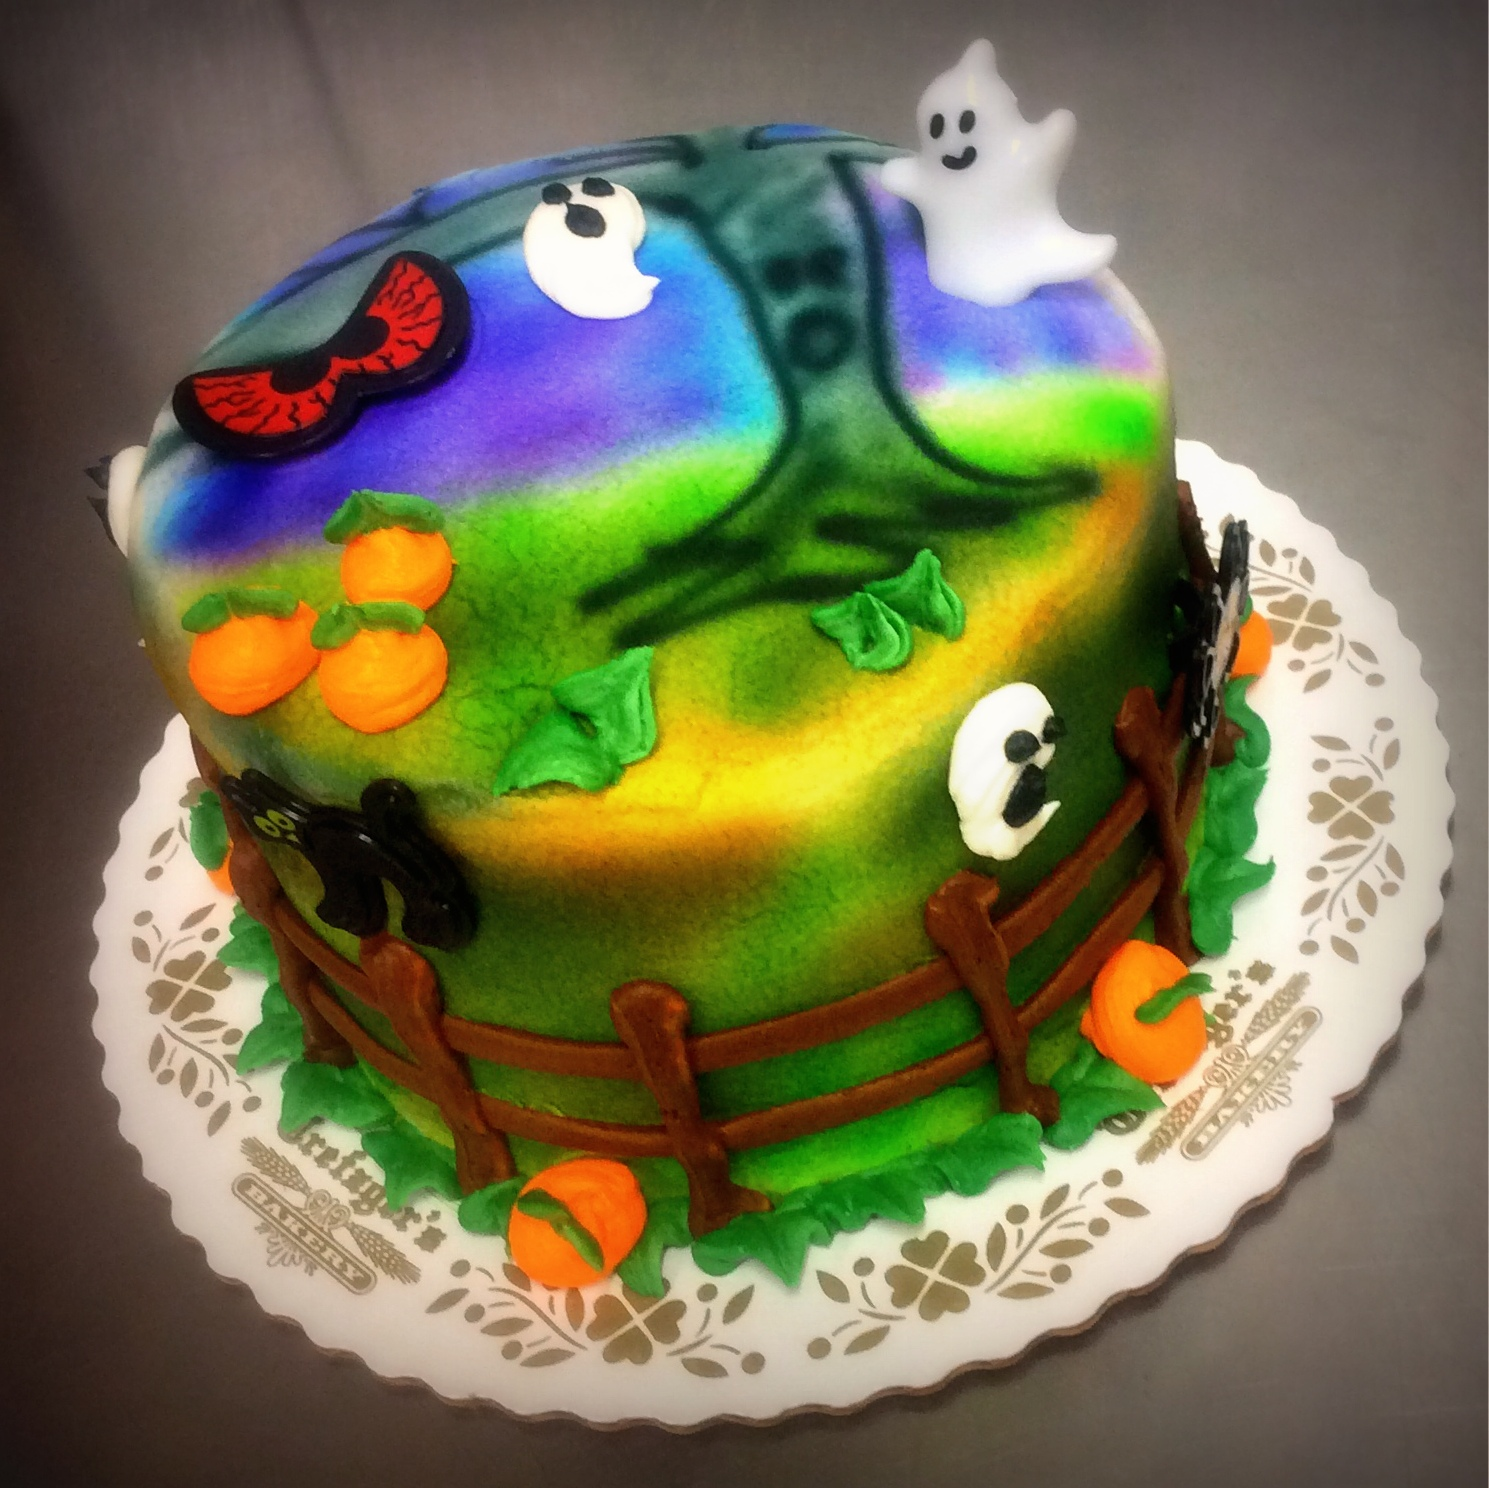 Halloween Round Cake with Airbrush Decoration